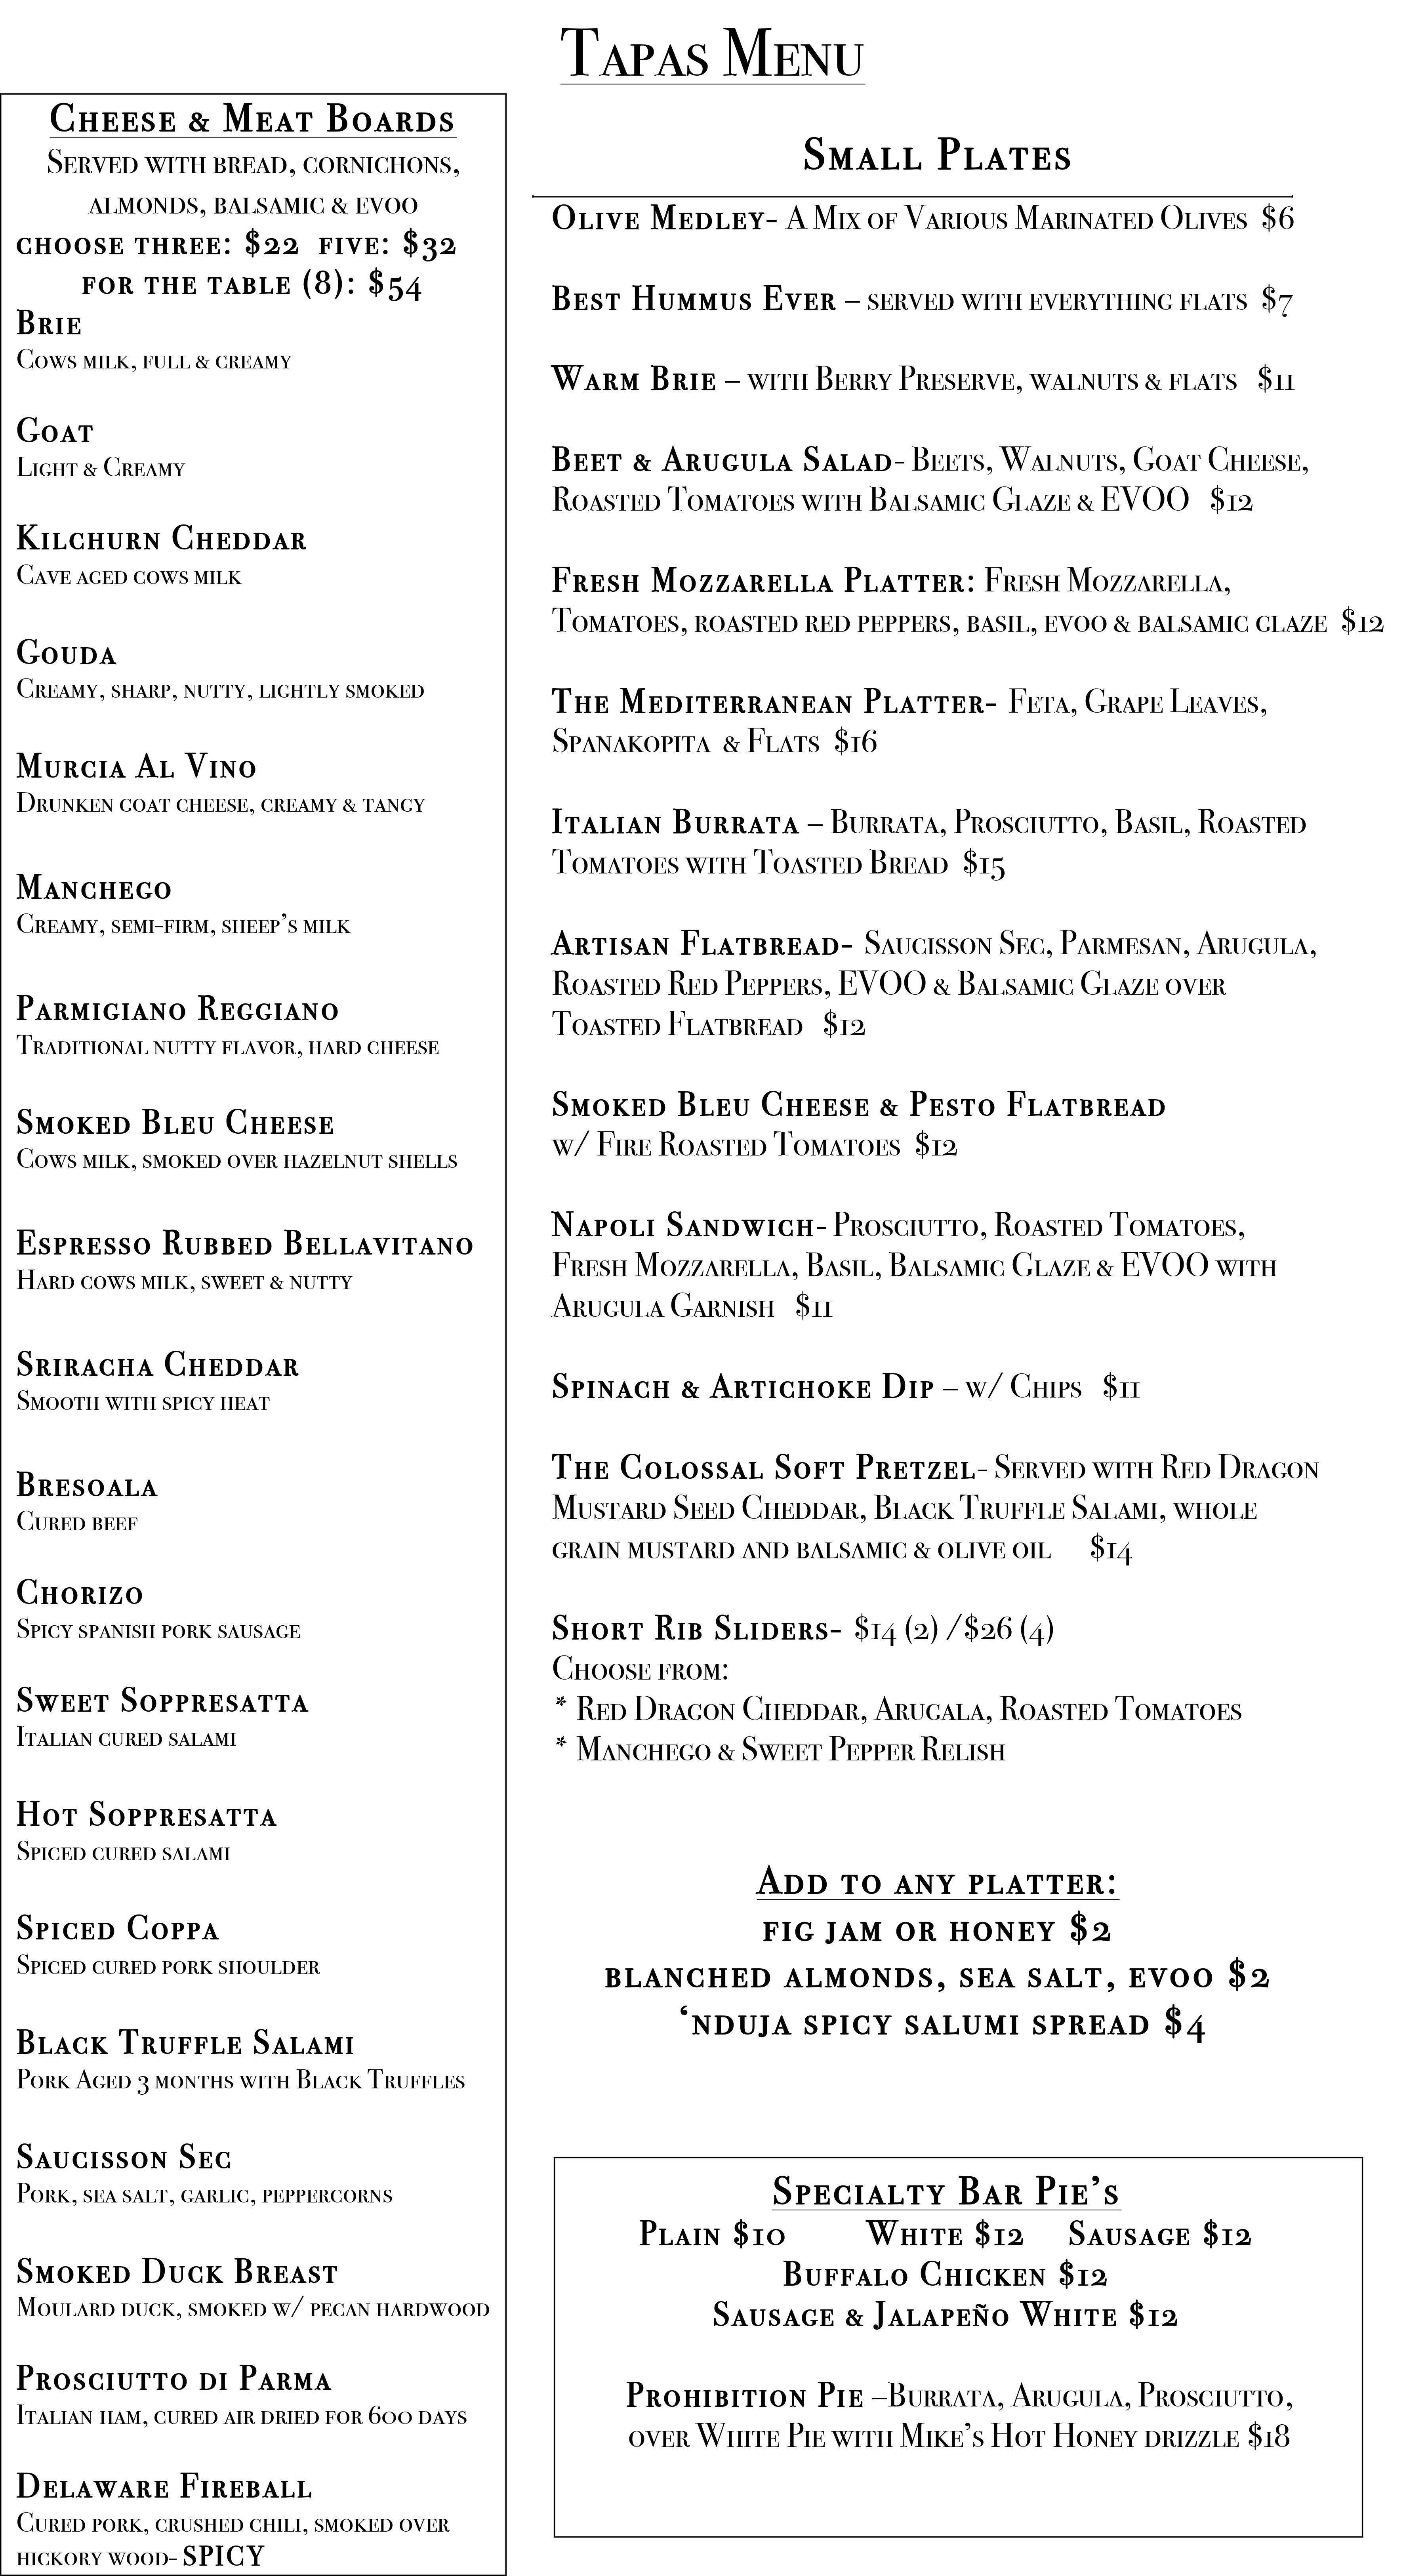 menu-new.jpg